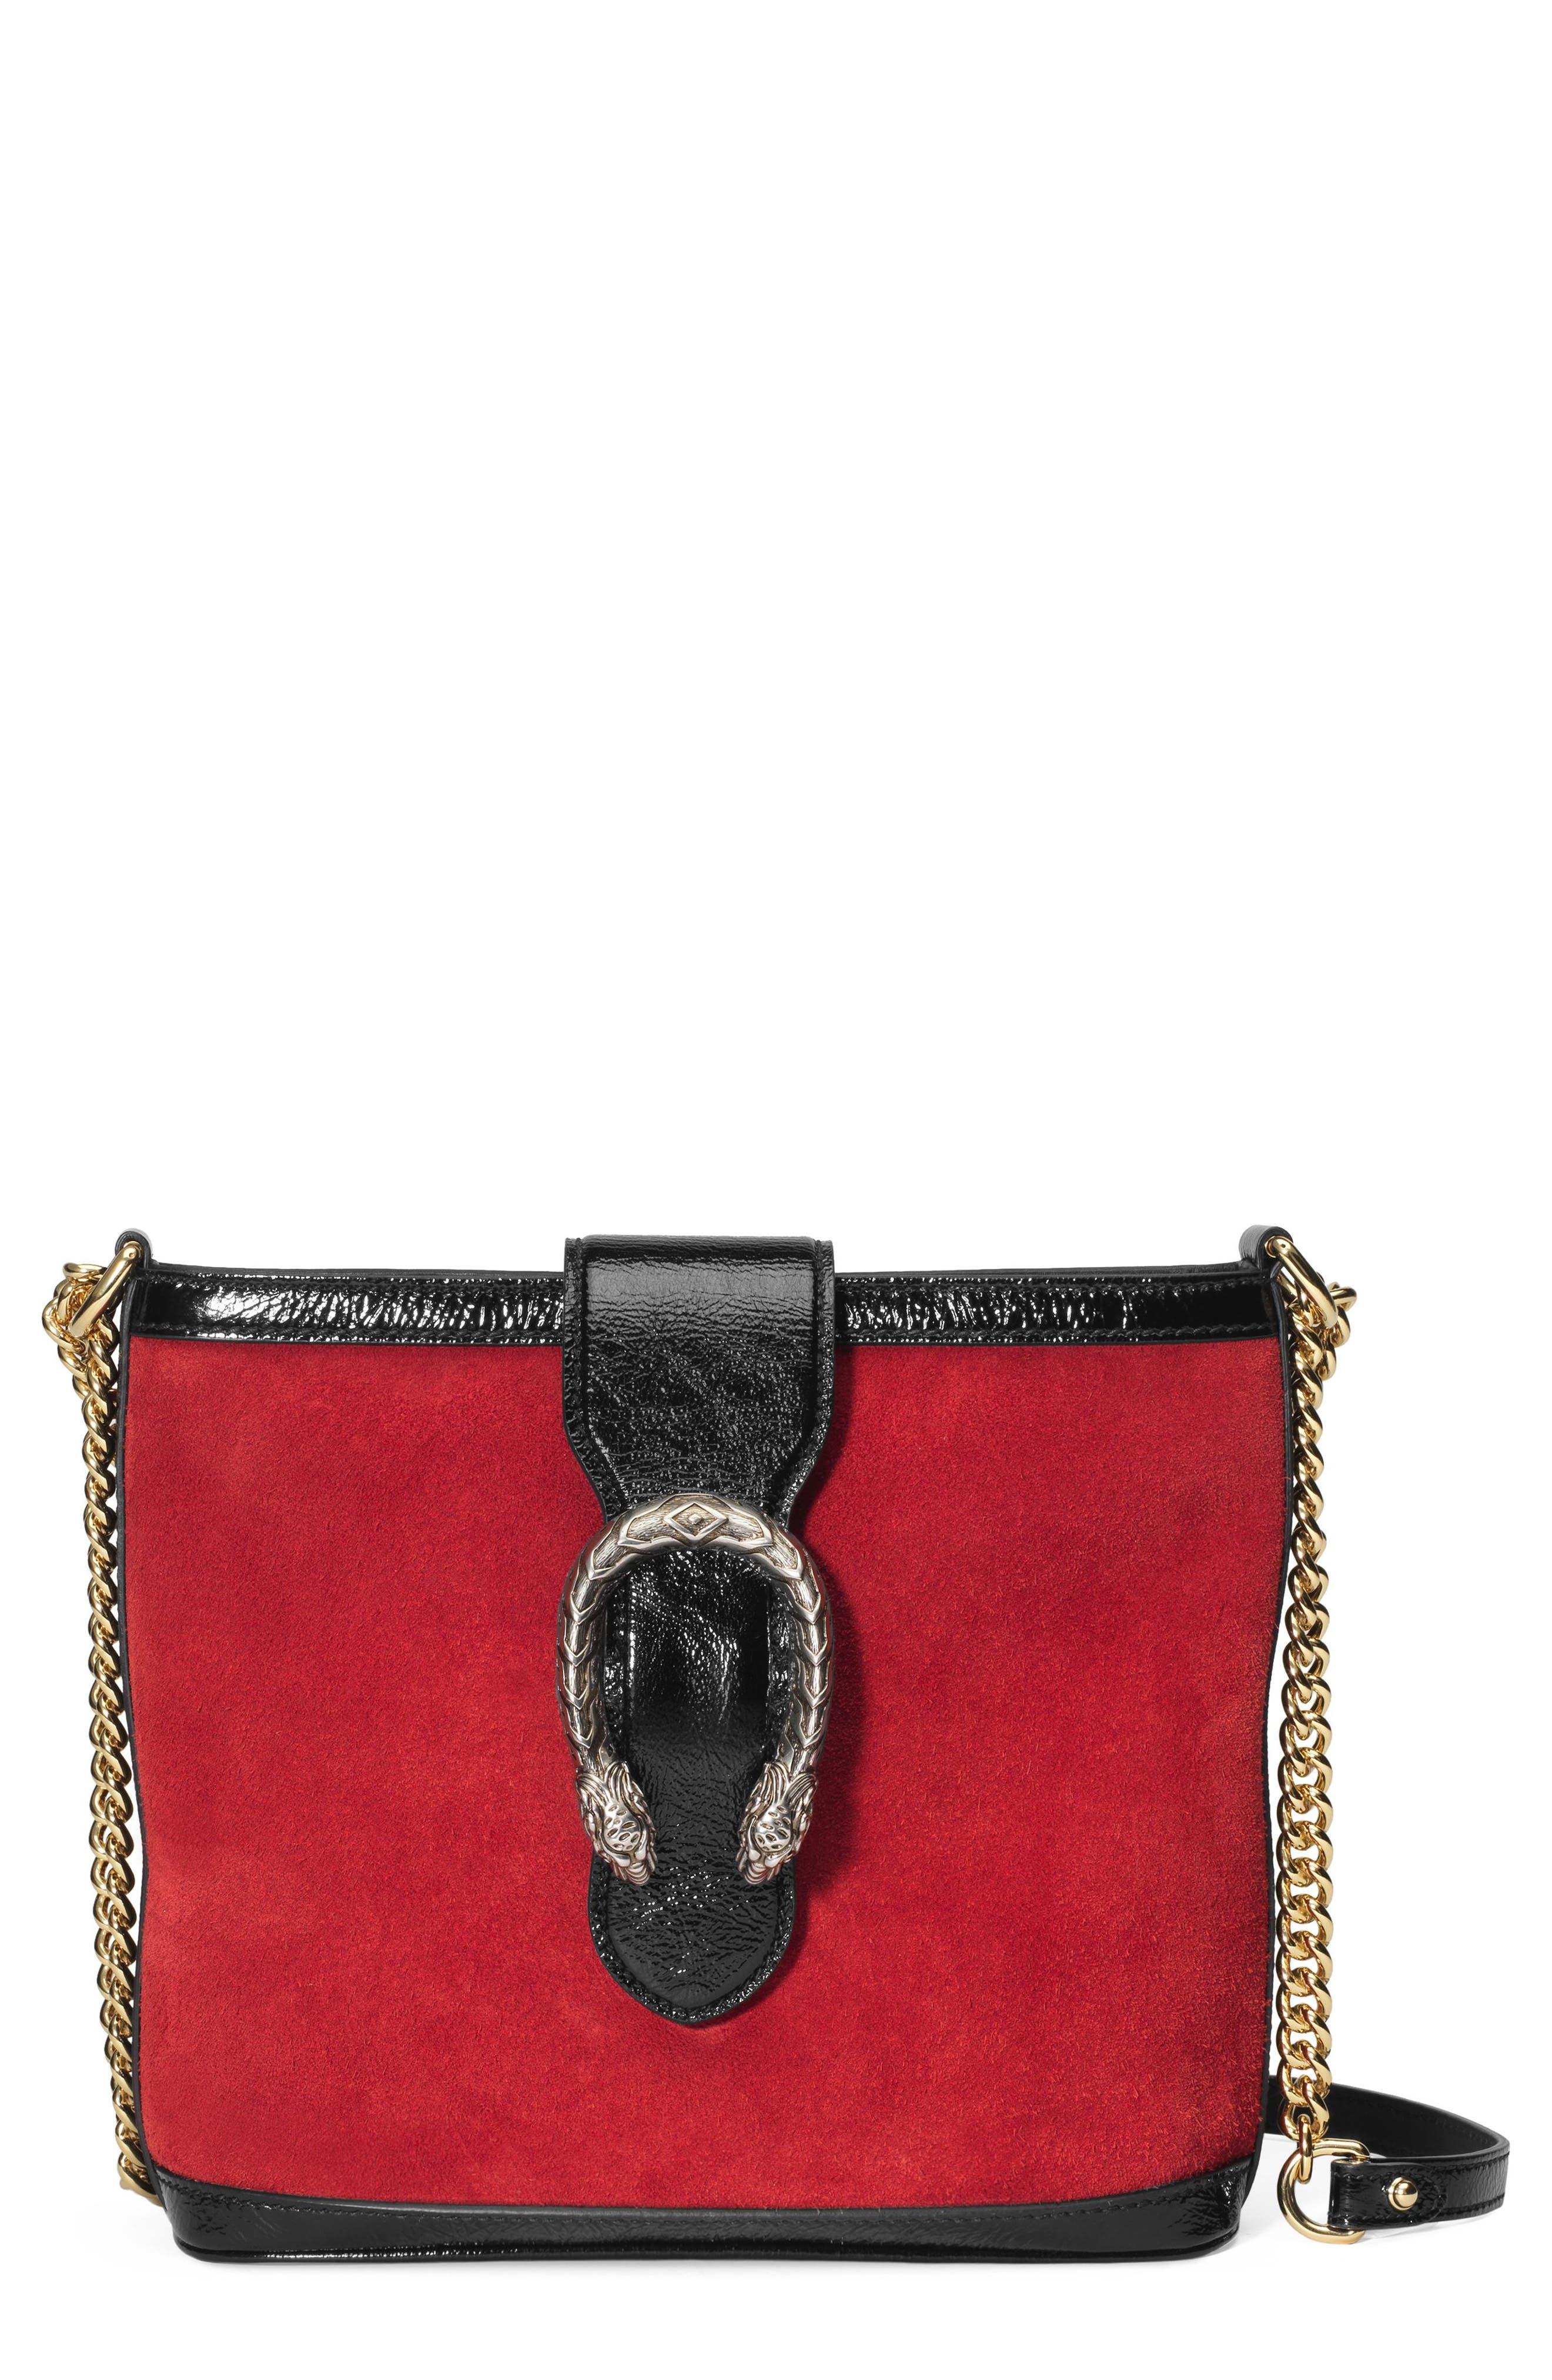 GUCCI Medium Dionysus Suede Shoulder Bag, Main, color, HIBISCUS RED/ NERO